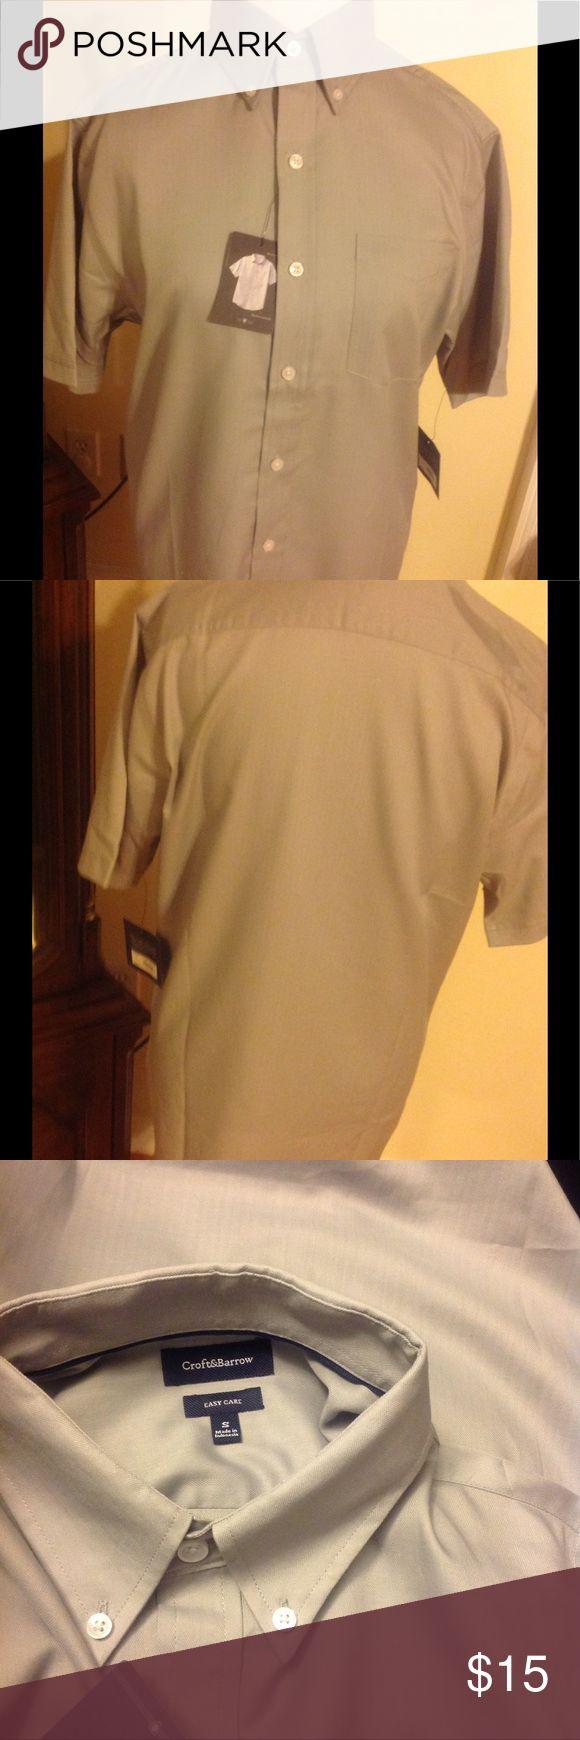 NWT Mens Croft & Barrow Short Sleeve Dress Shirt New Men's Gray Dress Shirt Sz Small. Collared,Short Sleeve,button down front croft & barrow Shirts Dress Shirts